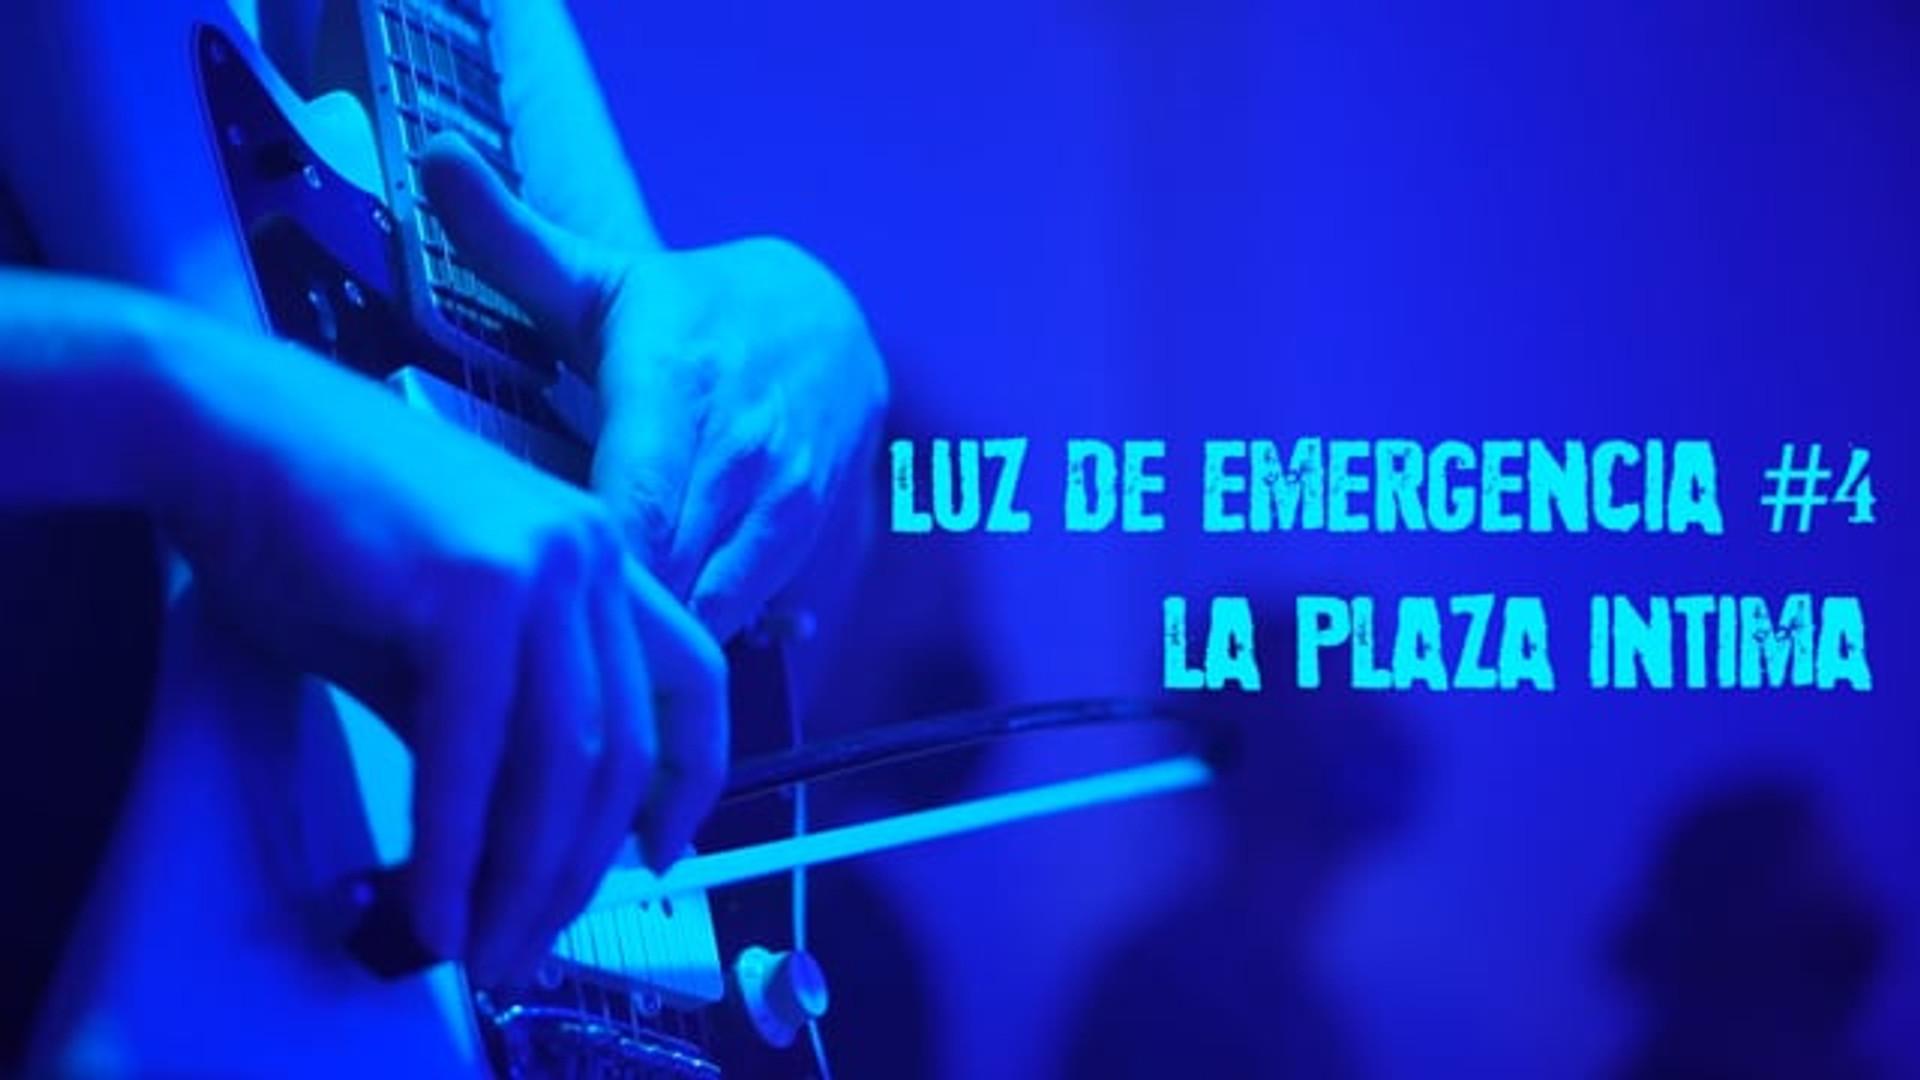 LuzDeEmergencia#4 - LA PLAÇA ÌNTIMA